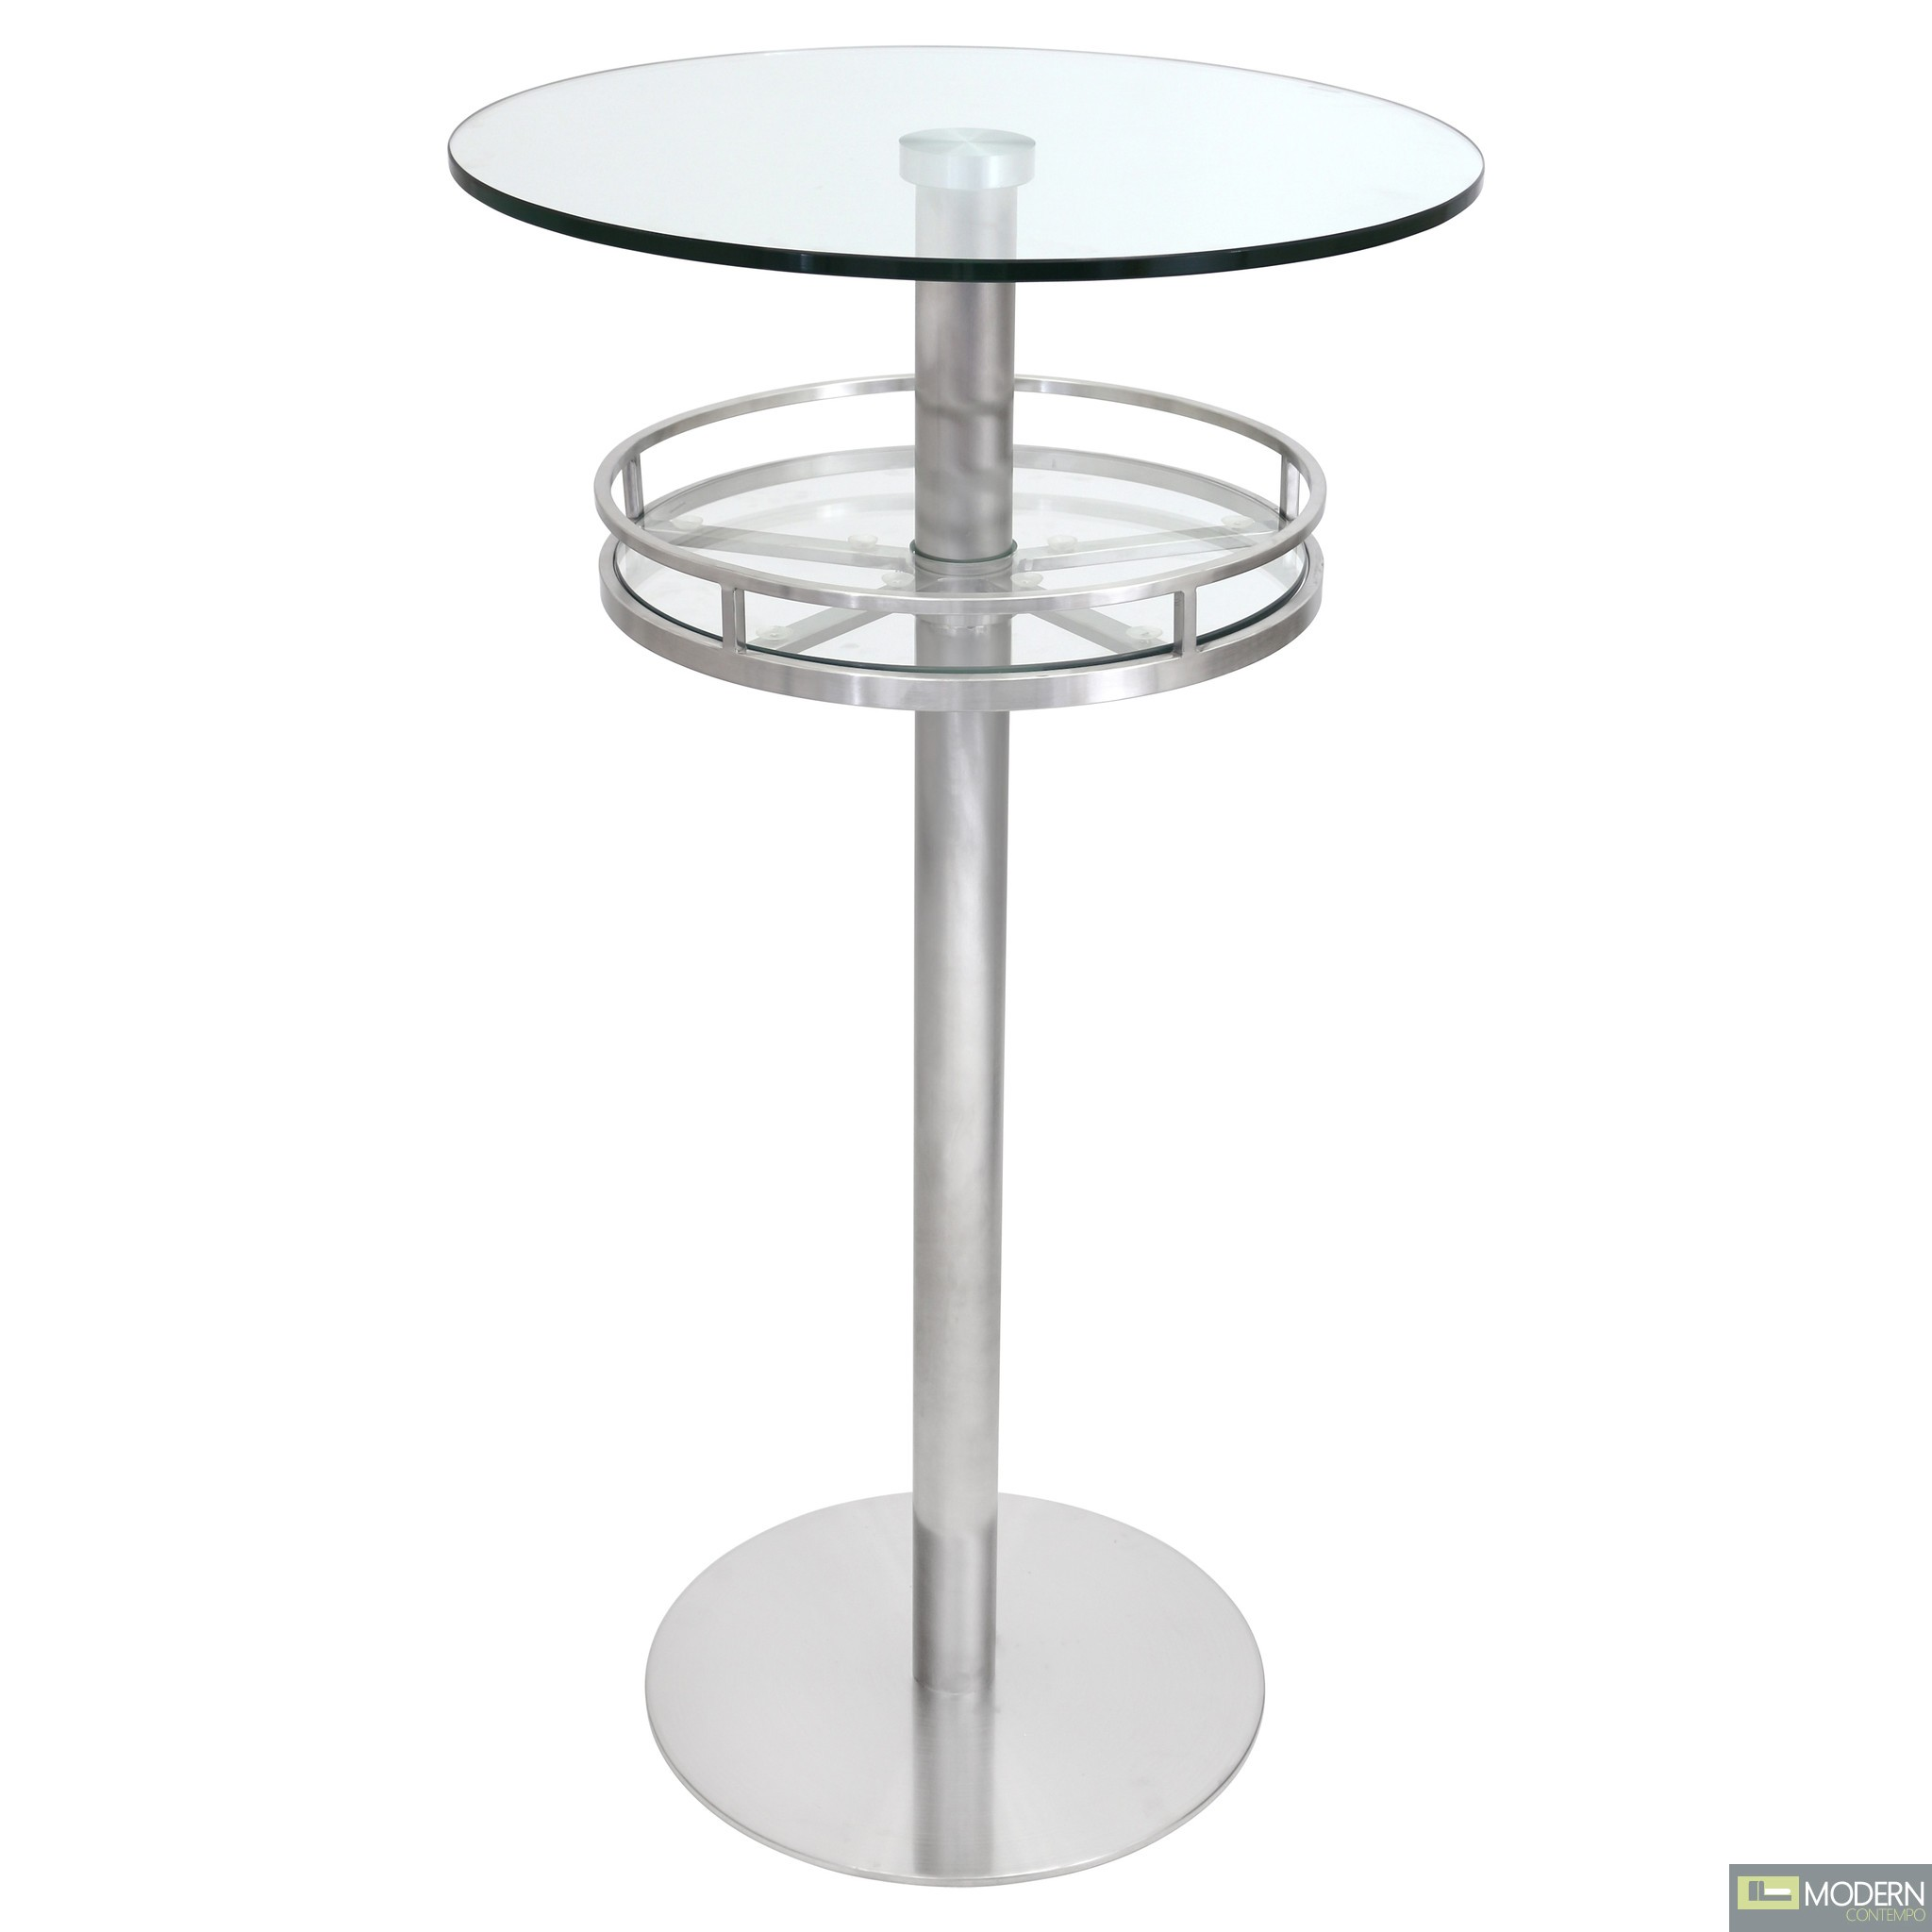 LumiSource Cora Bar Table